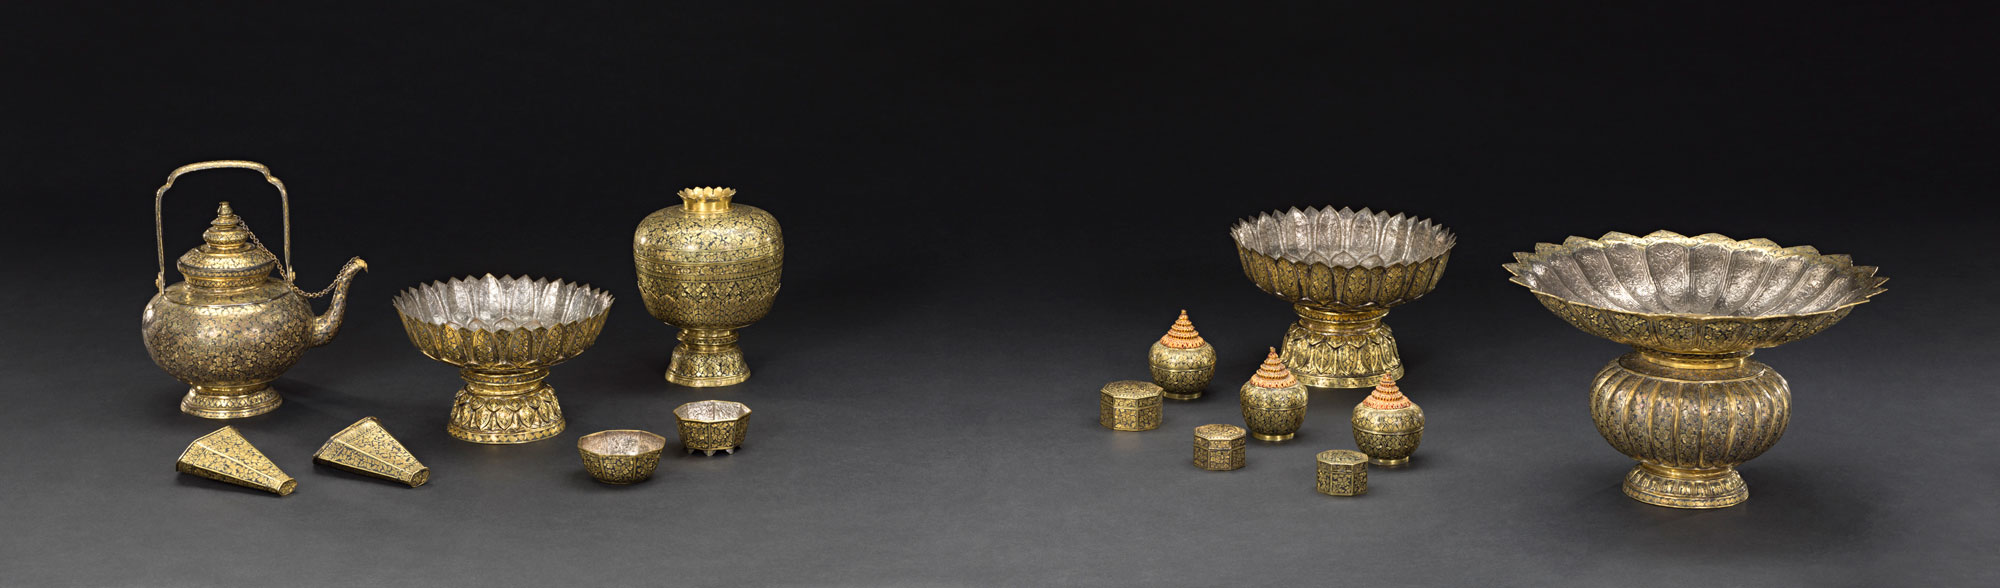 Gold Nielloware Waterpot, envelopes for betel leaf, stands, water bowl, lidded containers, and spittoon Gift from King Chulalongkorn to the Smithsonian Institution, 1876 Courtesy of the Smithsonian Institution, Department of Anthropology; Left: E27150-0, E27153-0, E27155-0, E27156; Right: E27149-0, E27153-0, E27157-0; Photo by Jim Di Loreto  ชุดเชี่ยนหมากถมตะทองและชุดเครื่องแป้งถมตะทอง กาน้ำ ซองพลู พานรอง ขัน โถปริก และกระโถนปากแตรใหญ่ ของขวัญพระราชทานจากพระบาทสมเด็จพระจุลจอมเกล้าเจ้าอยู่หัว แก่สถาบันสมิธโซเนียน พ.ศ. ๒๔๑๙ ได้รับความอนุเคราะห์จากฝ่ายมานุษยวิทยา สถาบันสมิธโซเนียน; ซ้าย: E27150-0, E27153-0, E27155-0, E27156; ขวา E27149-0, E27153-0, E27157-0; ถ่ายโดยจิม ดิลอเรโต